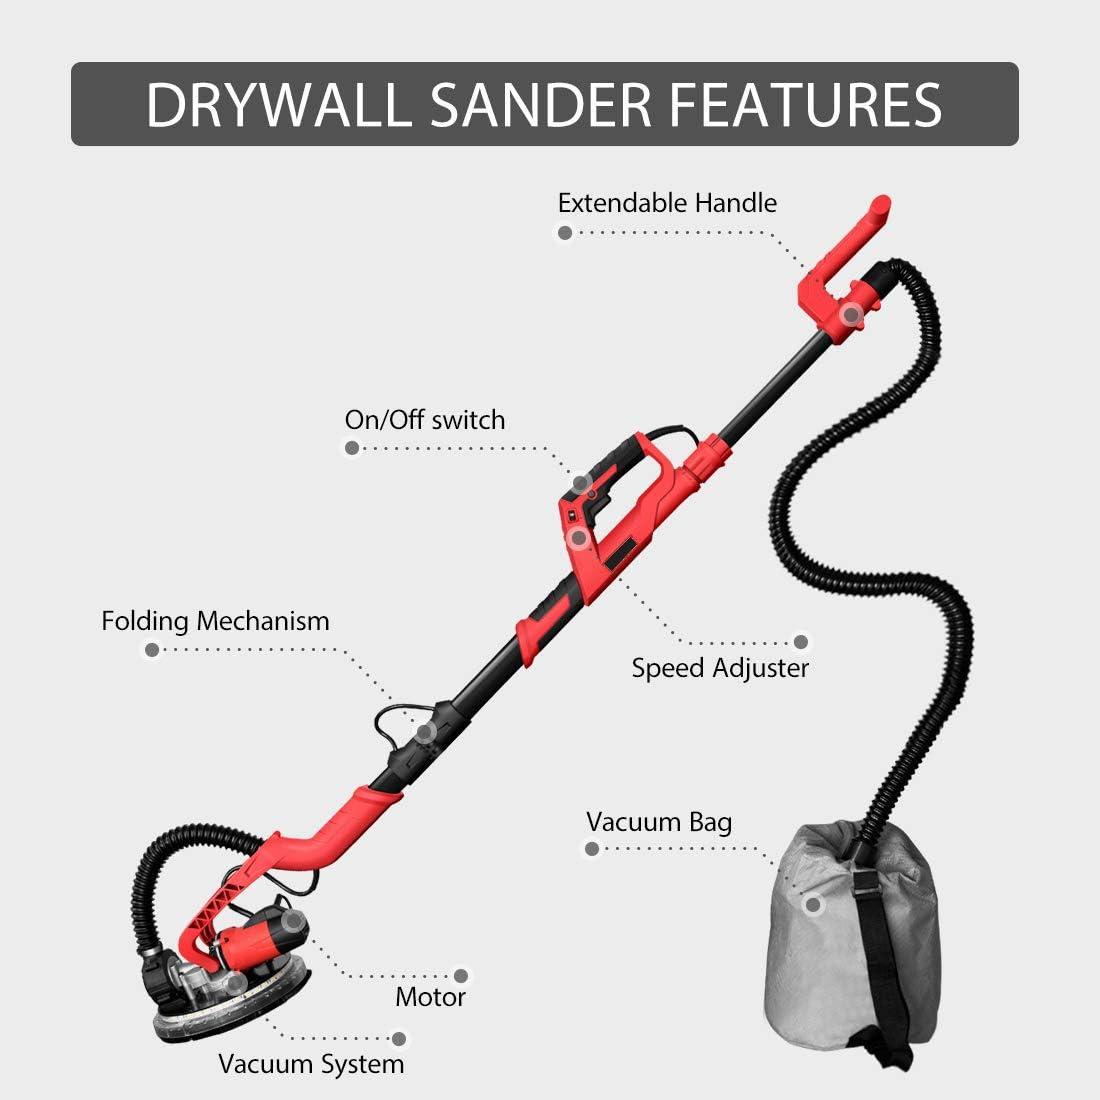 1850 LED Light POWER PRO 1850 Electric Drywall Sander Variable ...